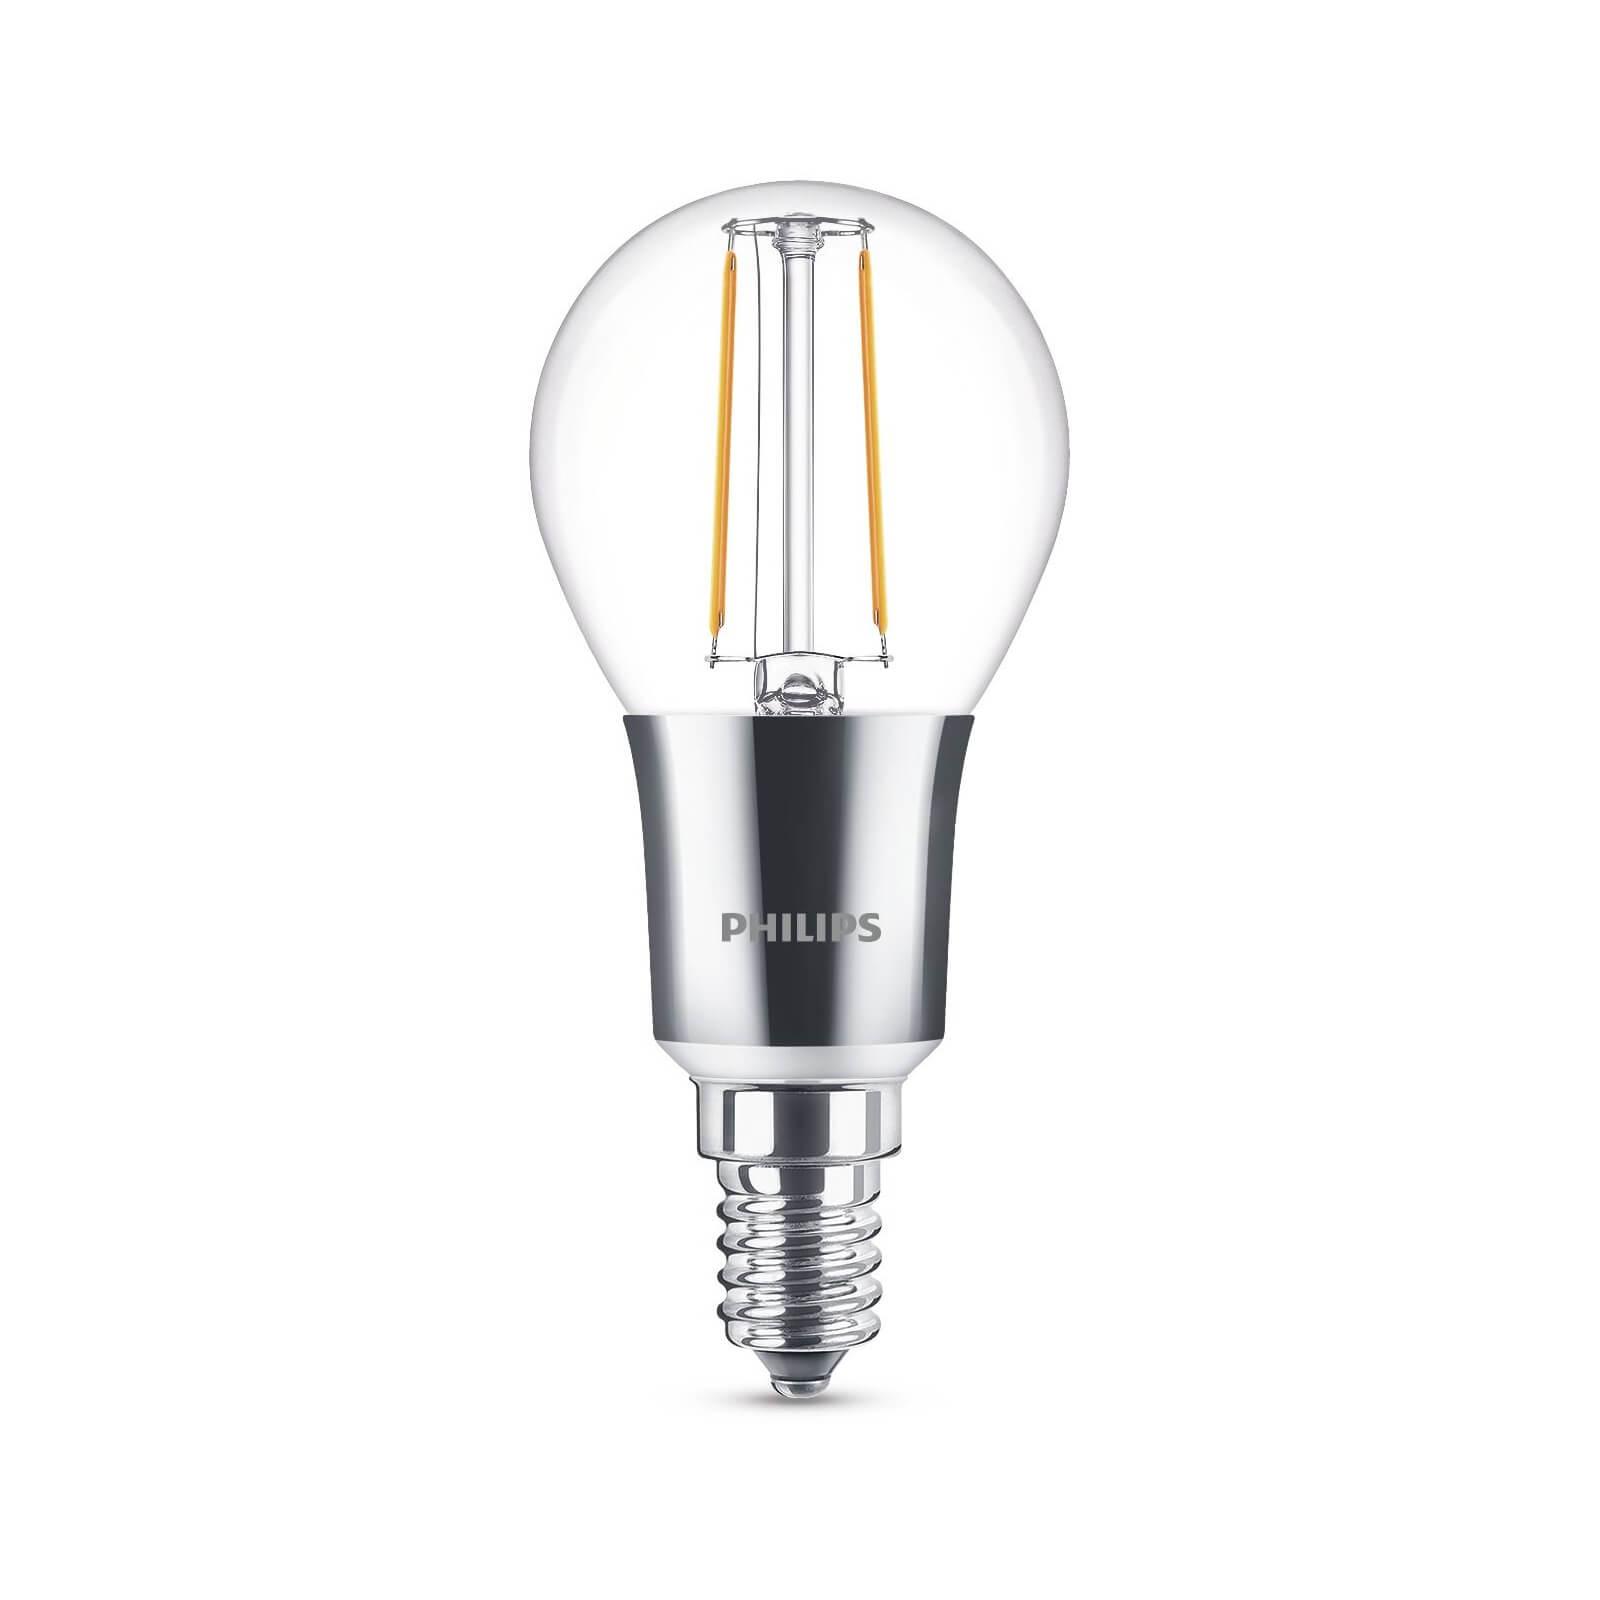 philips led lamp kogel helder 3w 25w e14 dimbaar. Black Bedroom Furniture Sets. Home Design Ideas